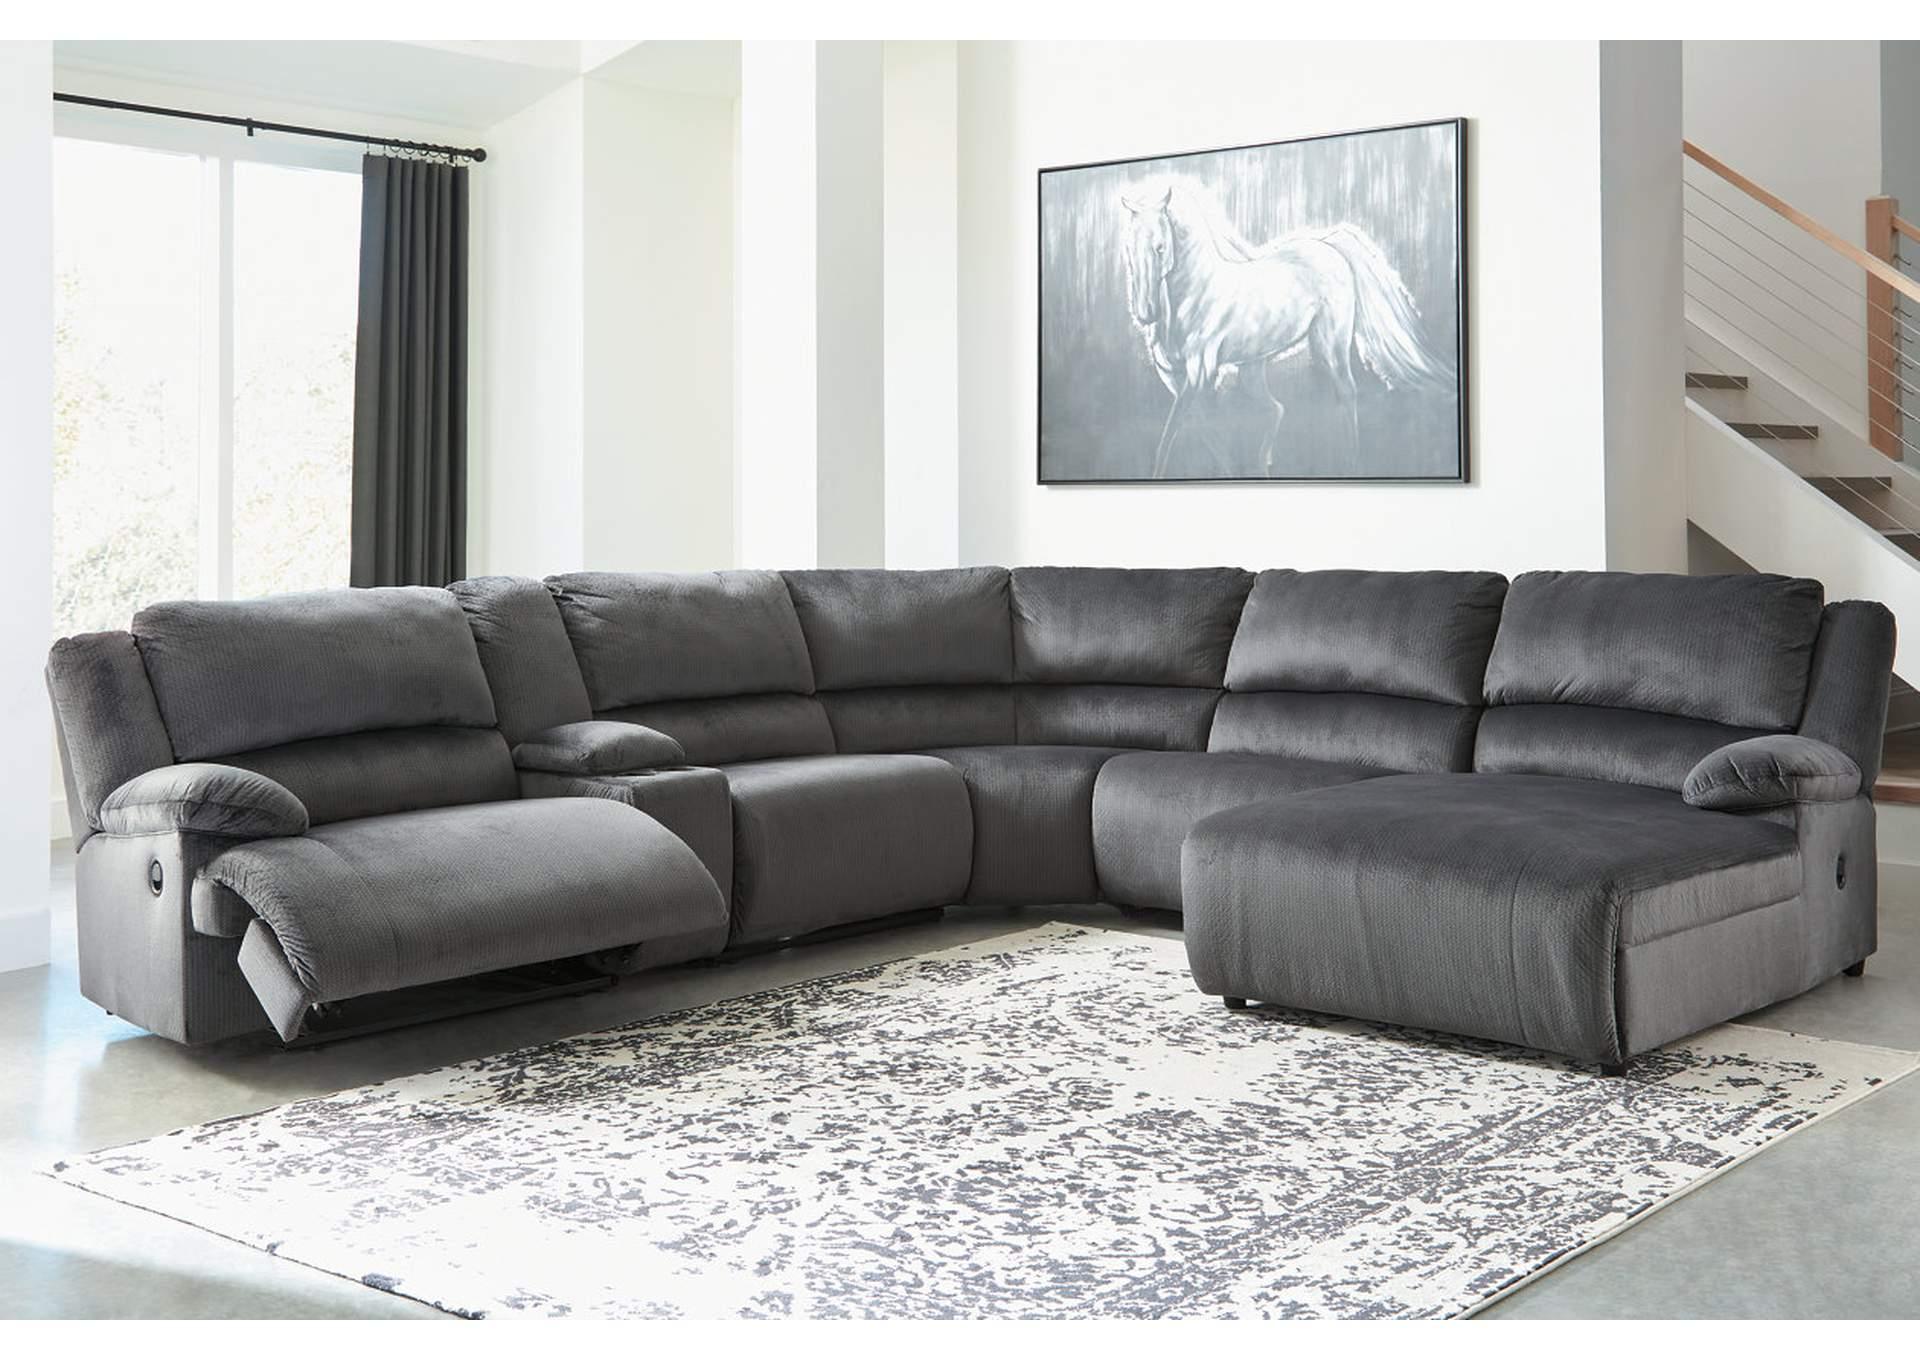 Cool Furniture American Furniture Of Slidell Clonmel Charcoal Inzonedesignstudio Interior Chair Design Inzonedesignstudiocom